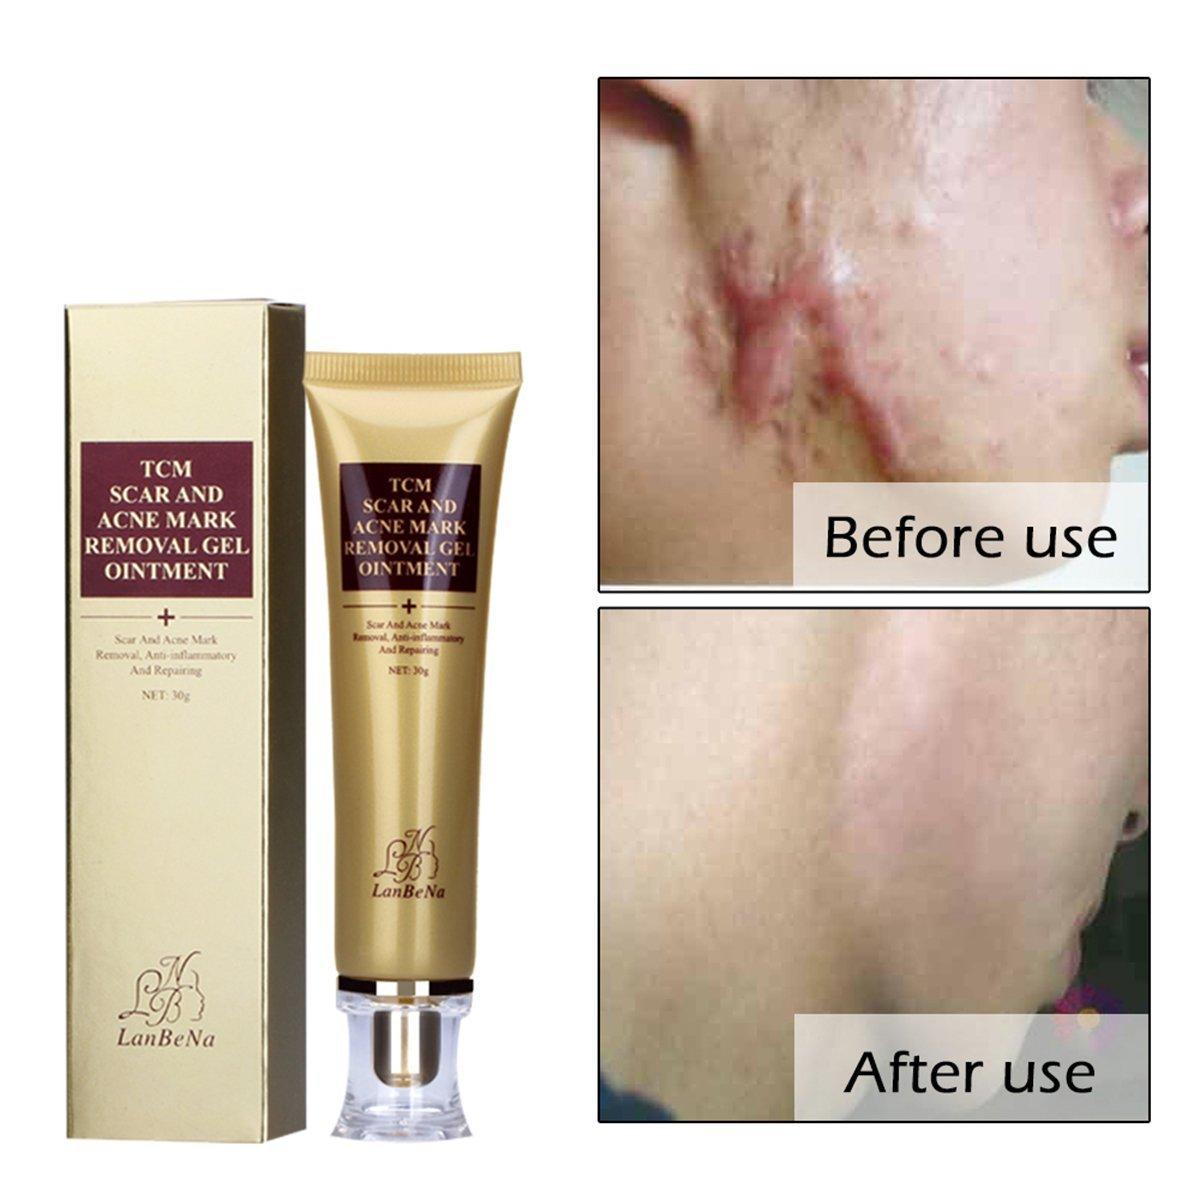 TCM Scar Removal Cream, Acne Treatment Acn Control Acne Scar Removal Gel Skin Repair for Face ear Leg Body Scarring Acne Spots Stretch Burn Scar Remover Marks 30ml